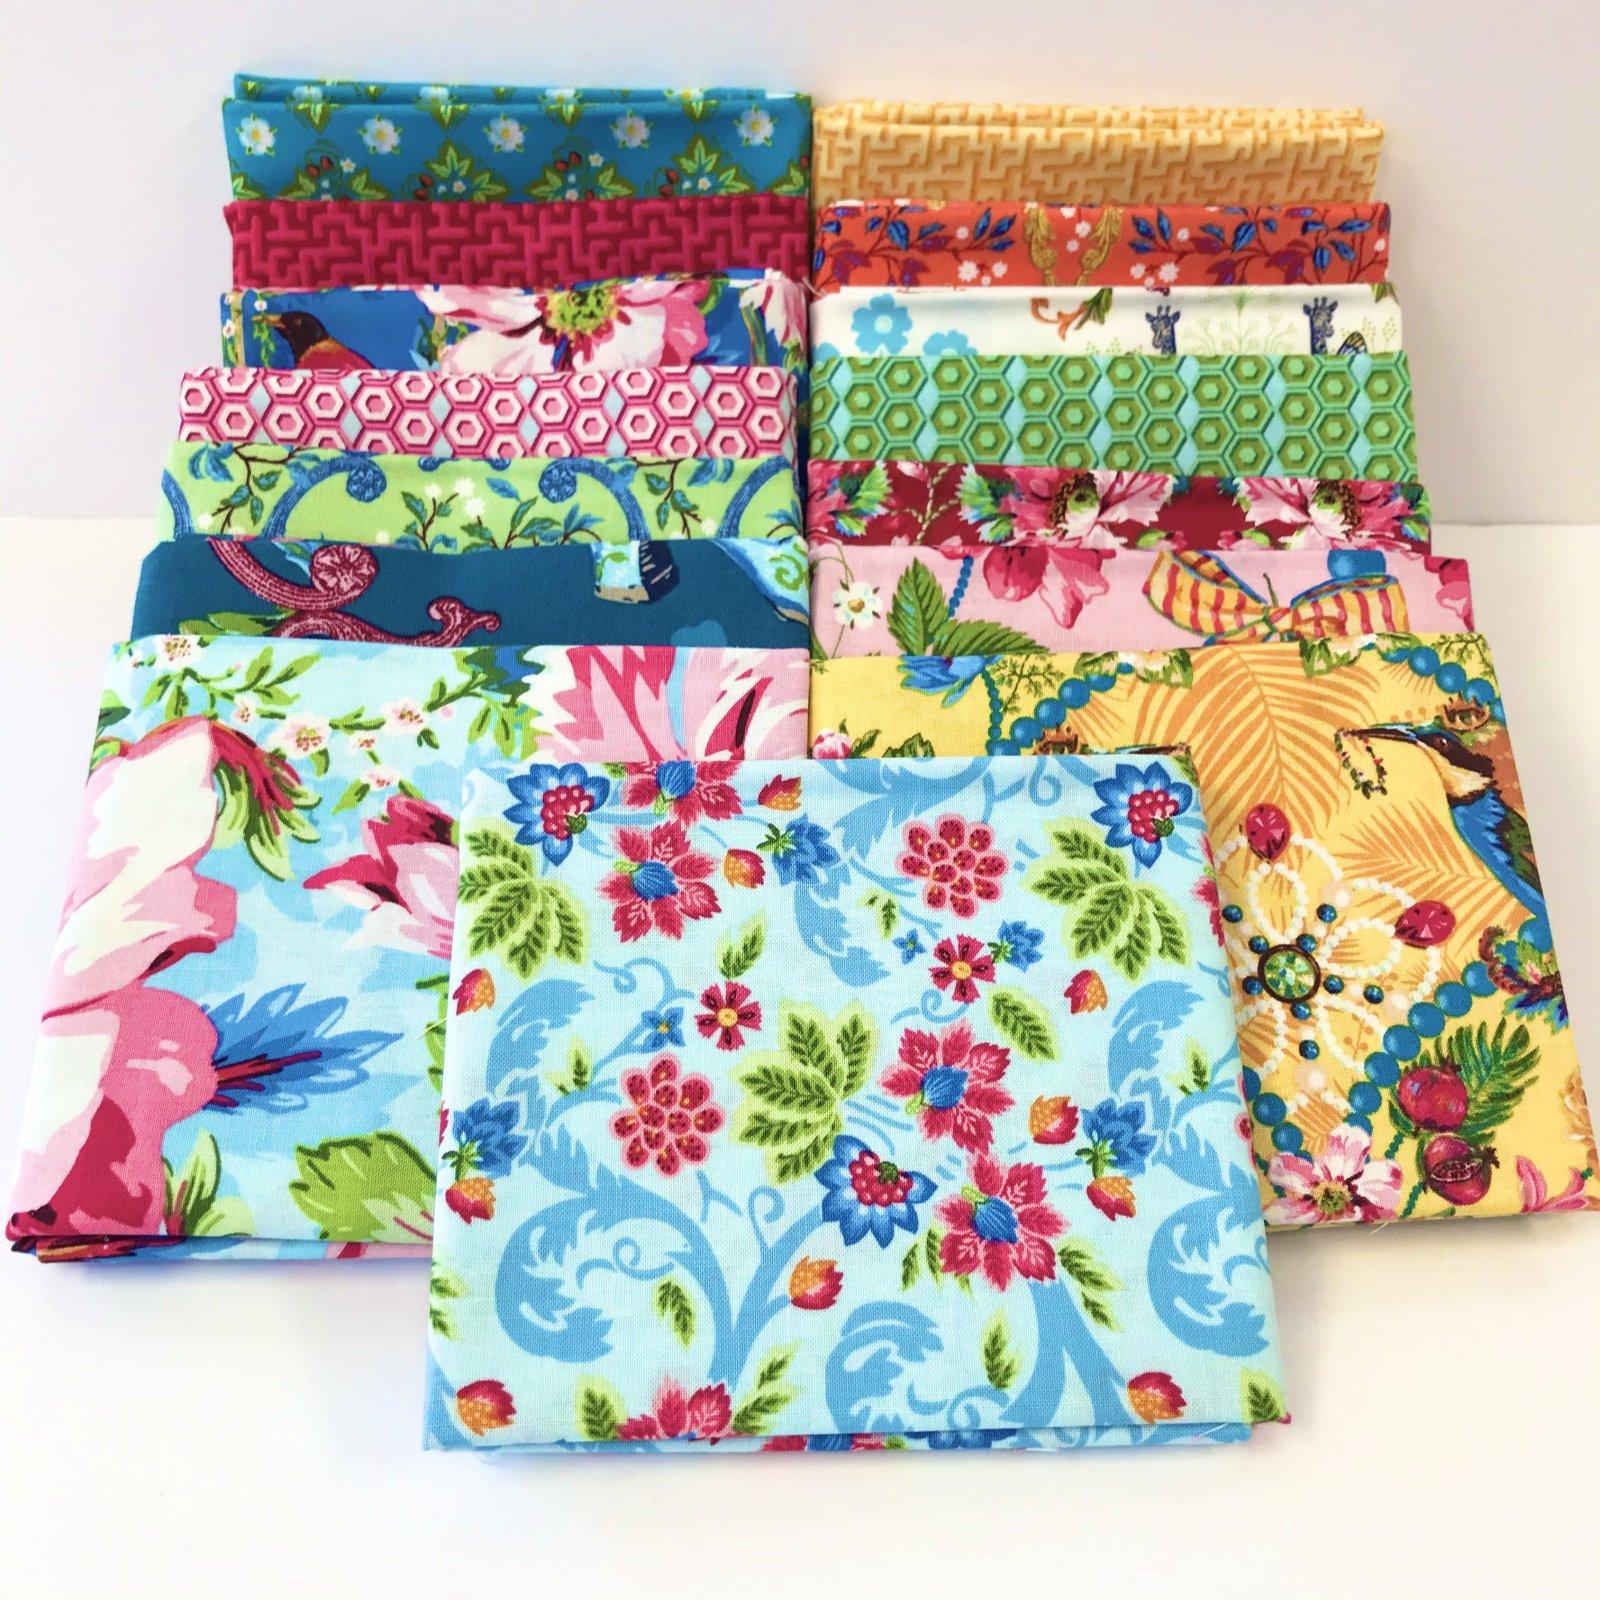 Jardin de la Reine by Odile Bailloeul for Free Spirit Fabrics - Full Collection Bundles